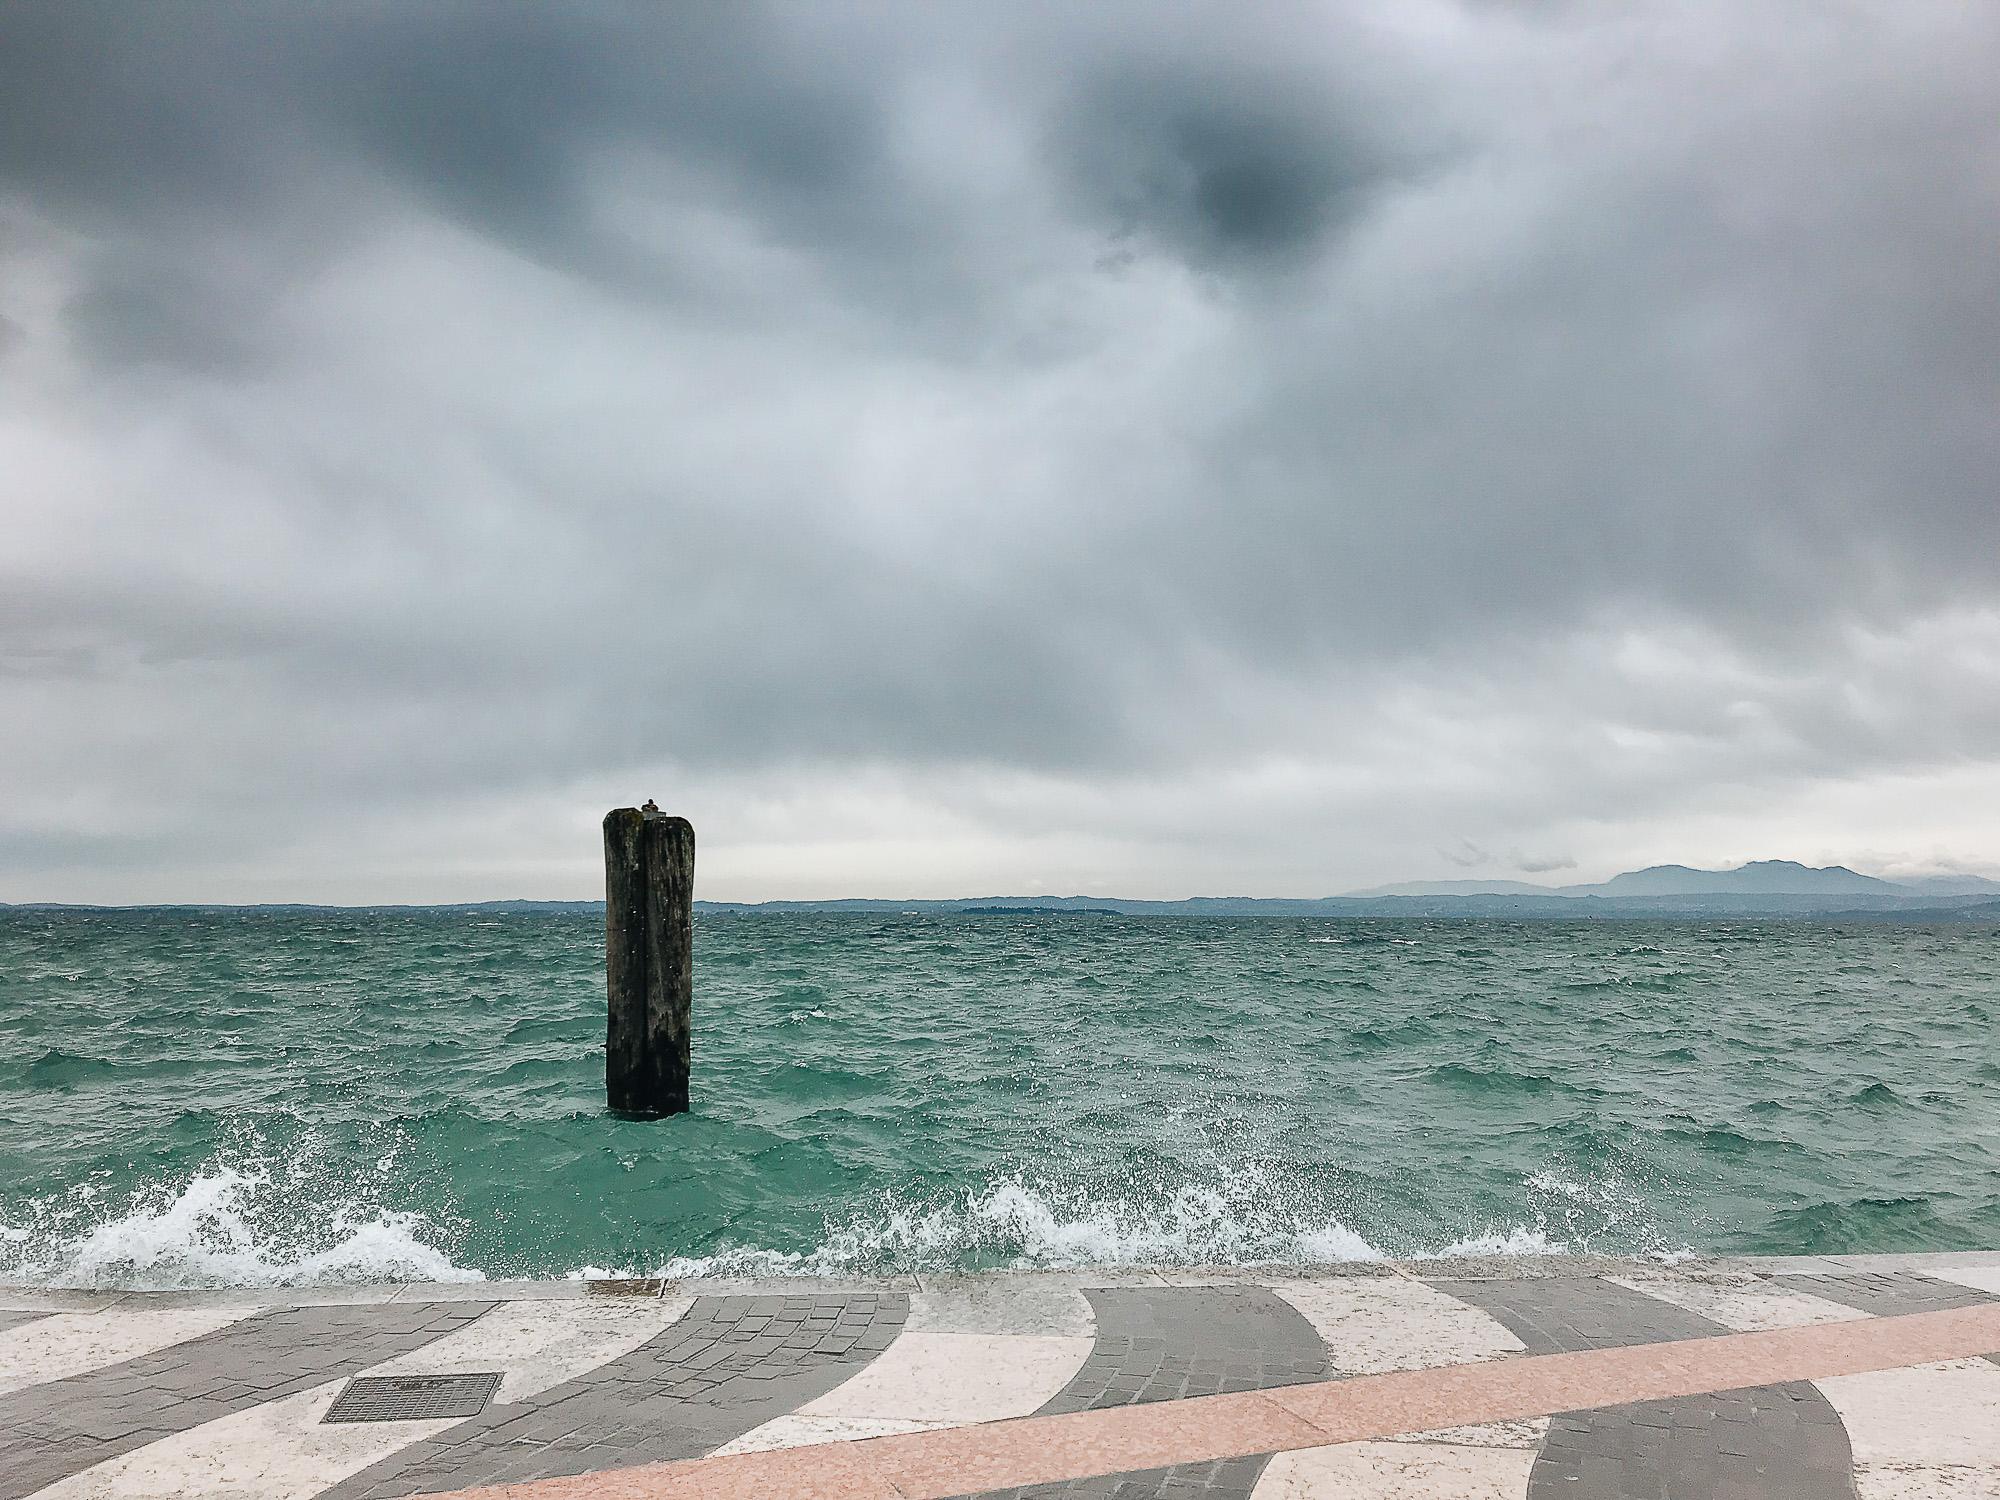 OurBeautifulAdventure-LakeGarda-Italy-Blog-6421.jpg